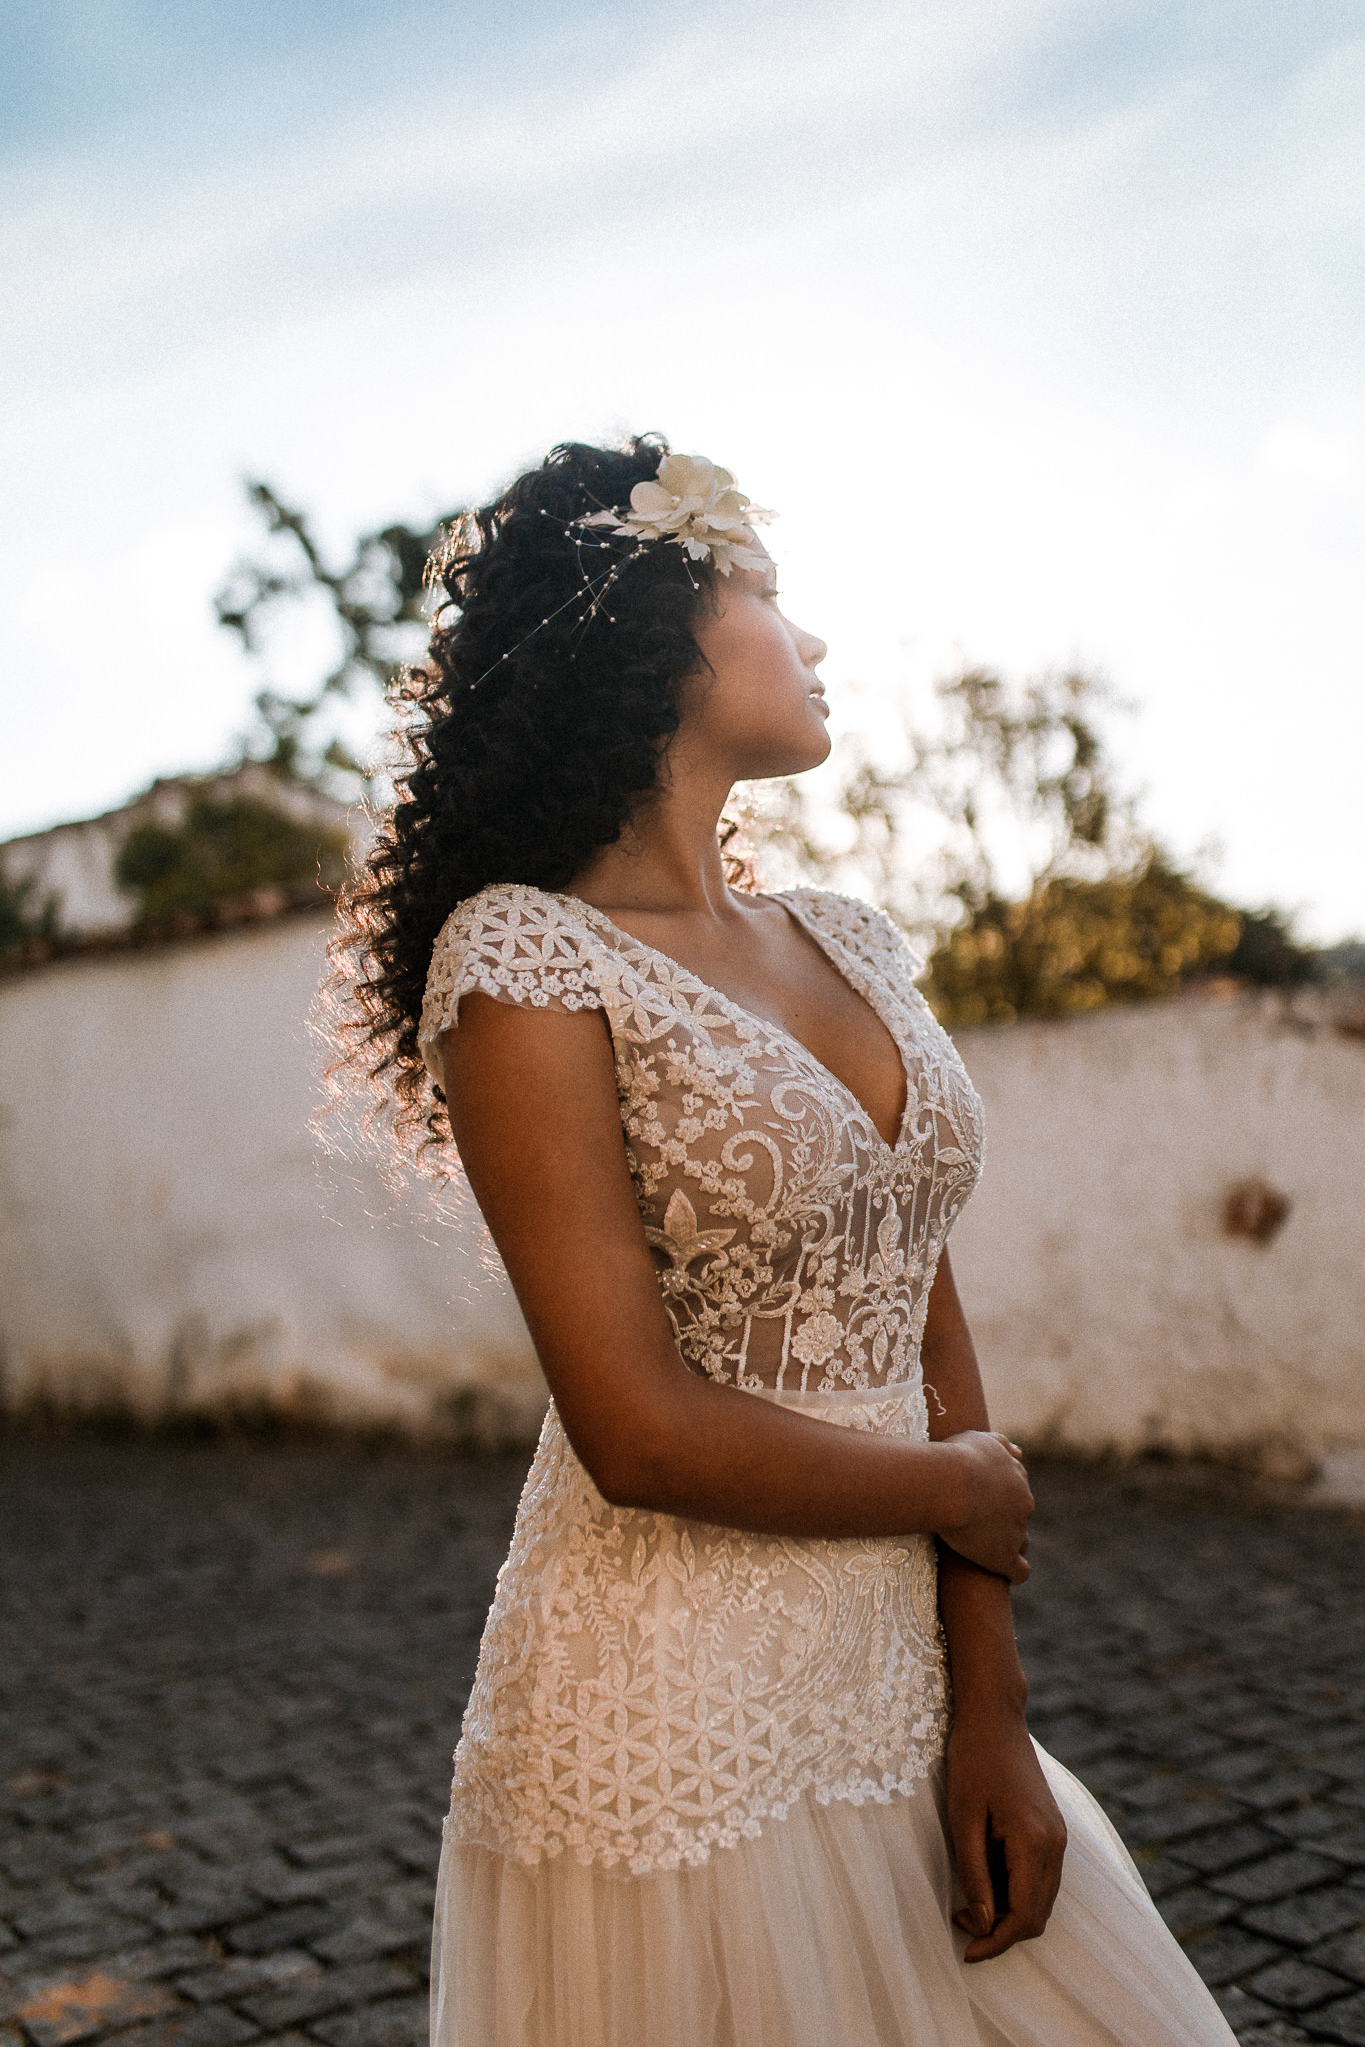 Vestido Noiva Leve Renda Casamento Praia Campo